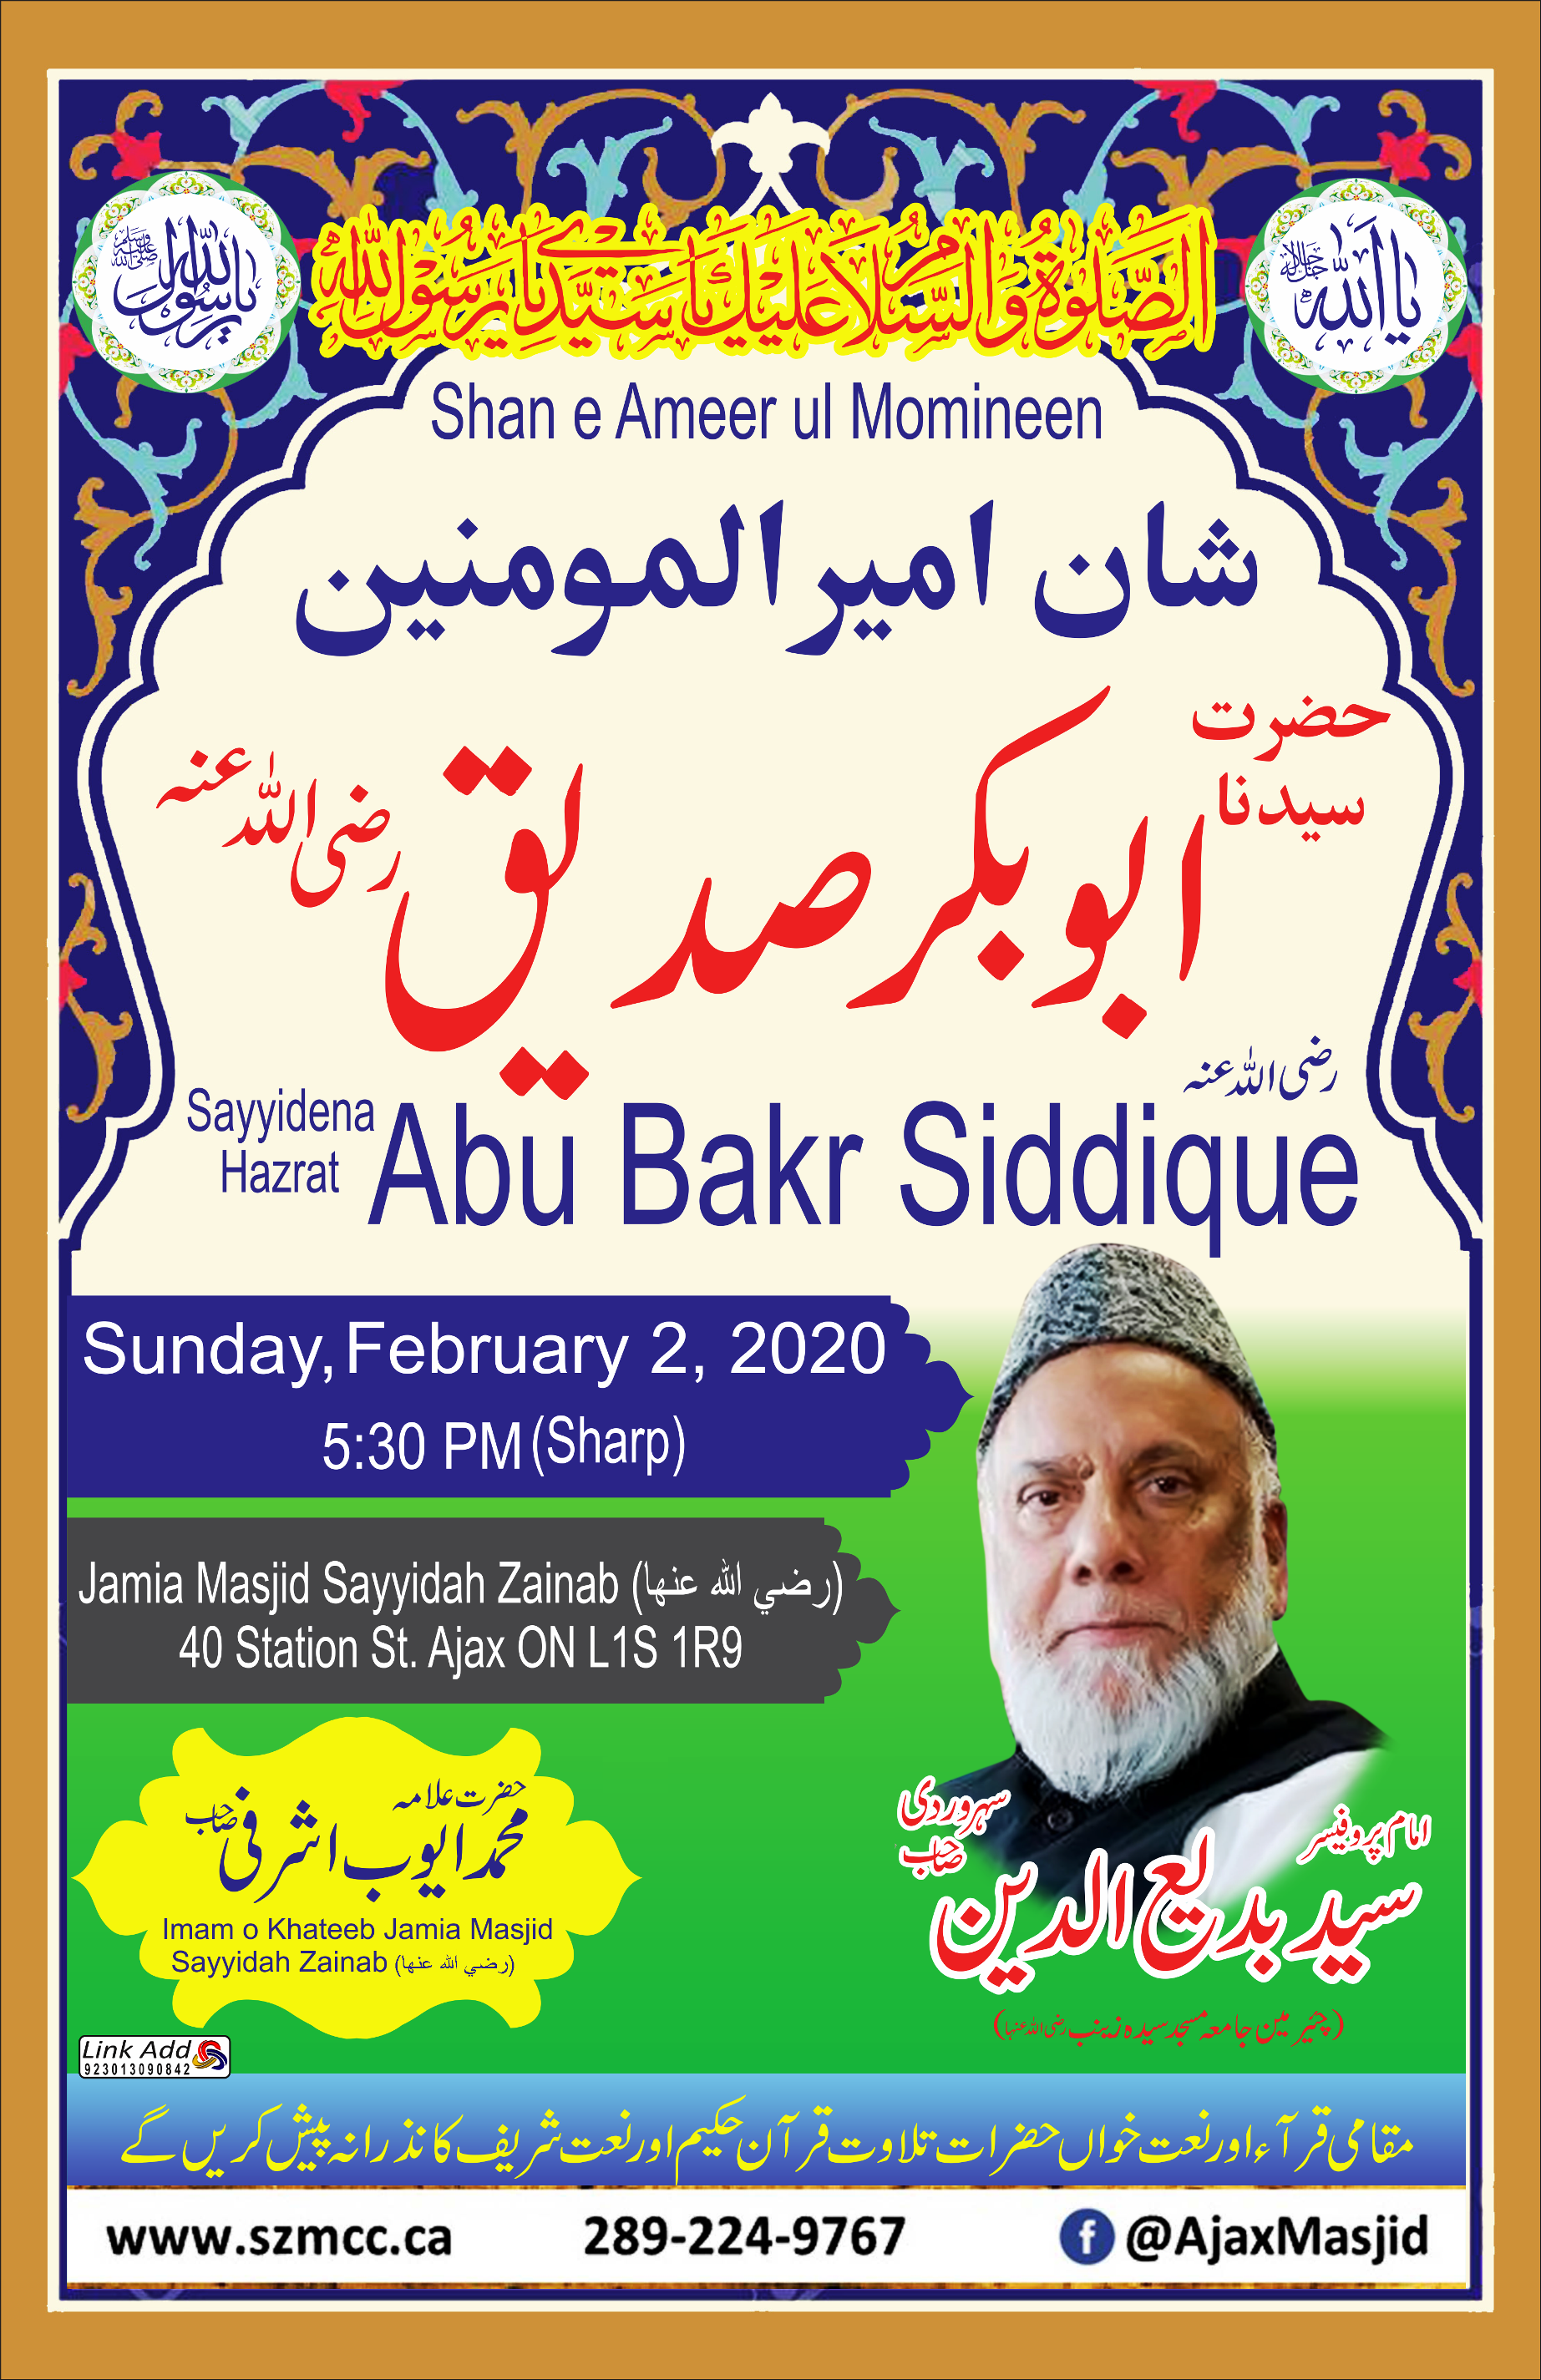 2020-02-02-shan-e-sayyidena-hazrat-abu-bakr-siddique-ra-copy